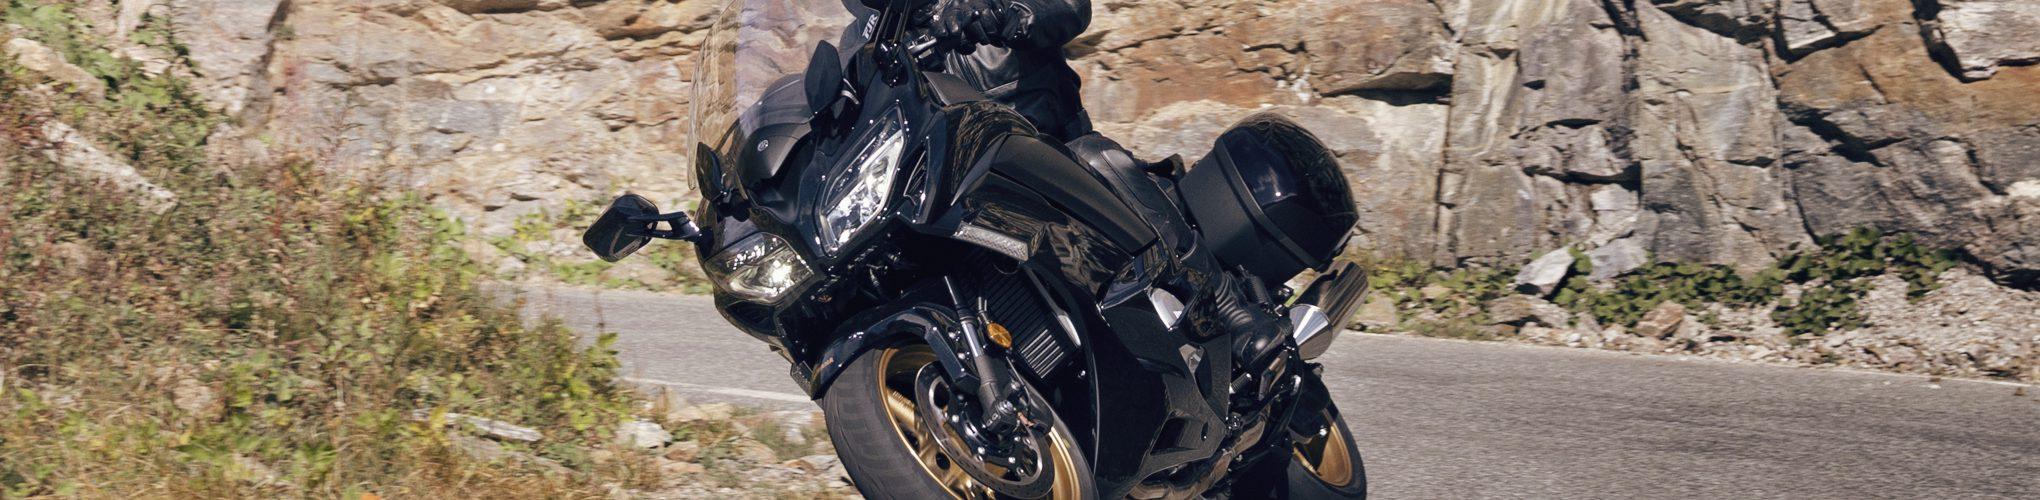 Yamaha FJR1300 Ultimate Edition | MotorCentrumWest